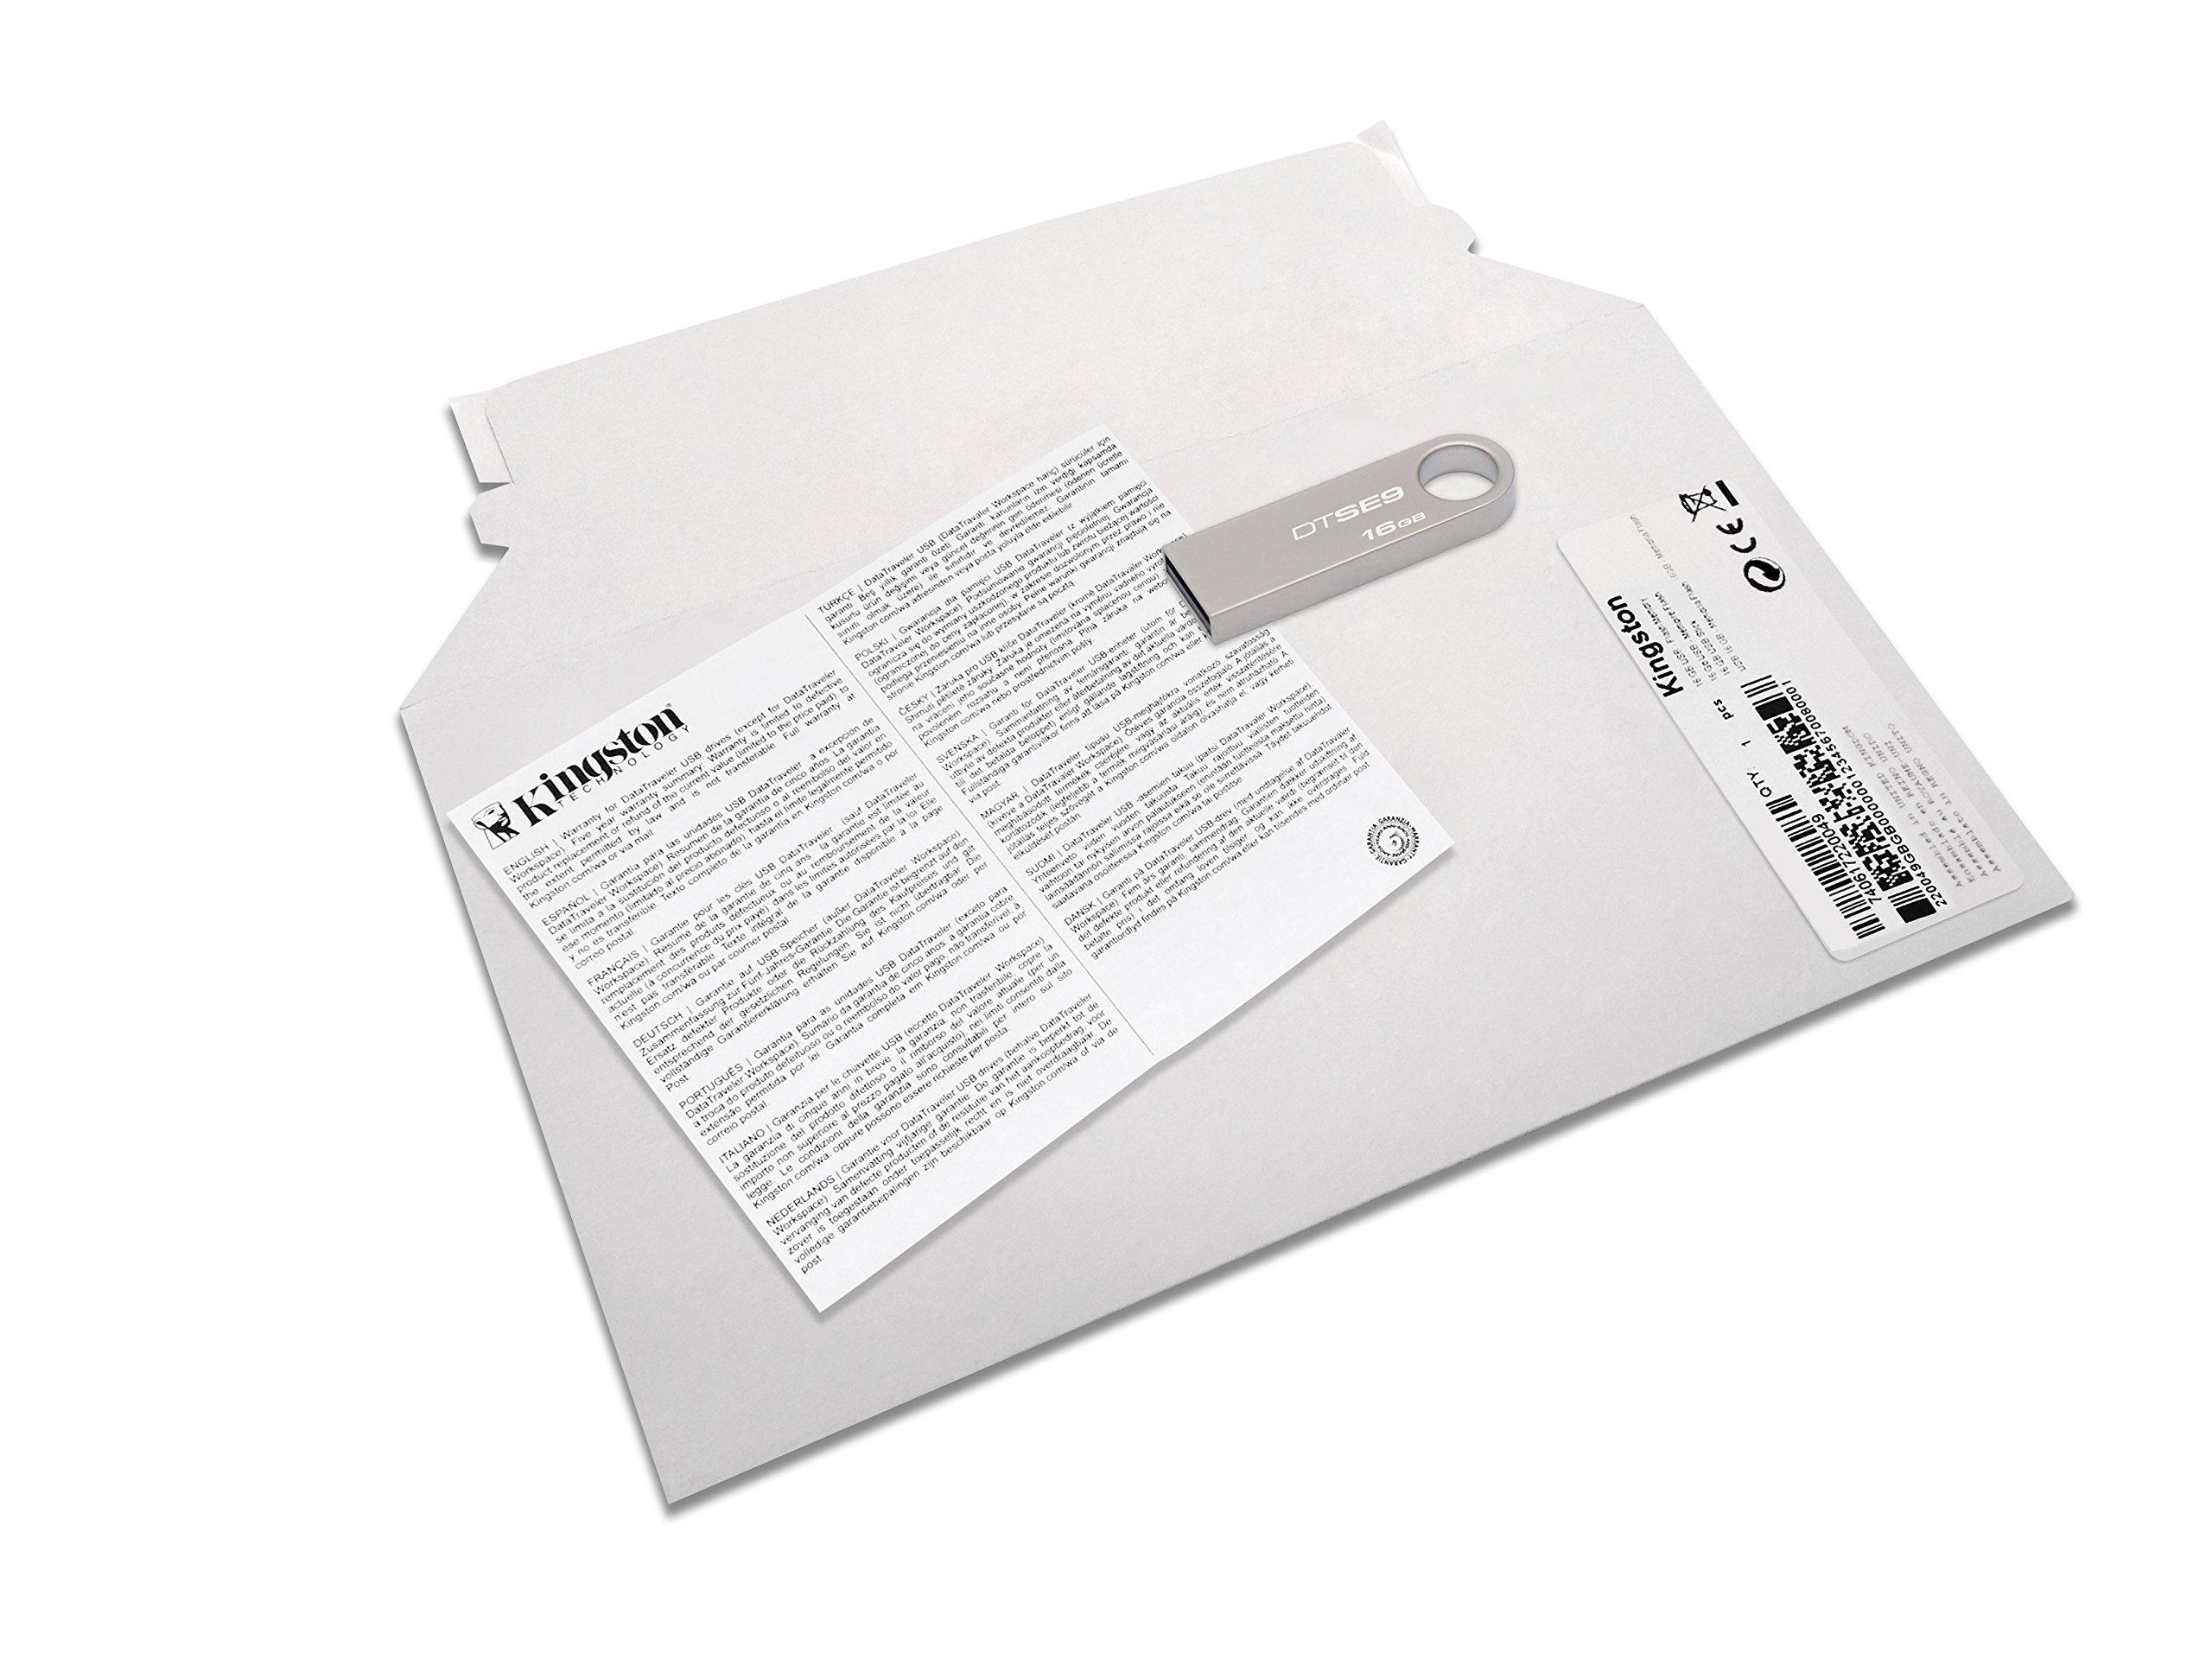 Kingston DataTraveler SE9 Memoria USB Portatile 16 GB, USB 2.0 [Imballaggio apertura facile di Amazon]